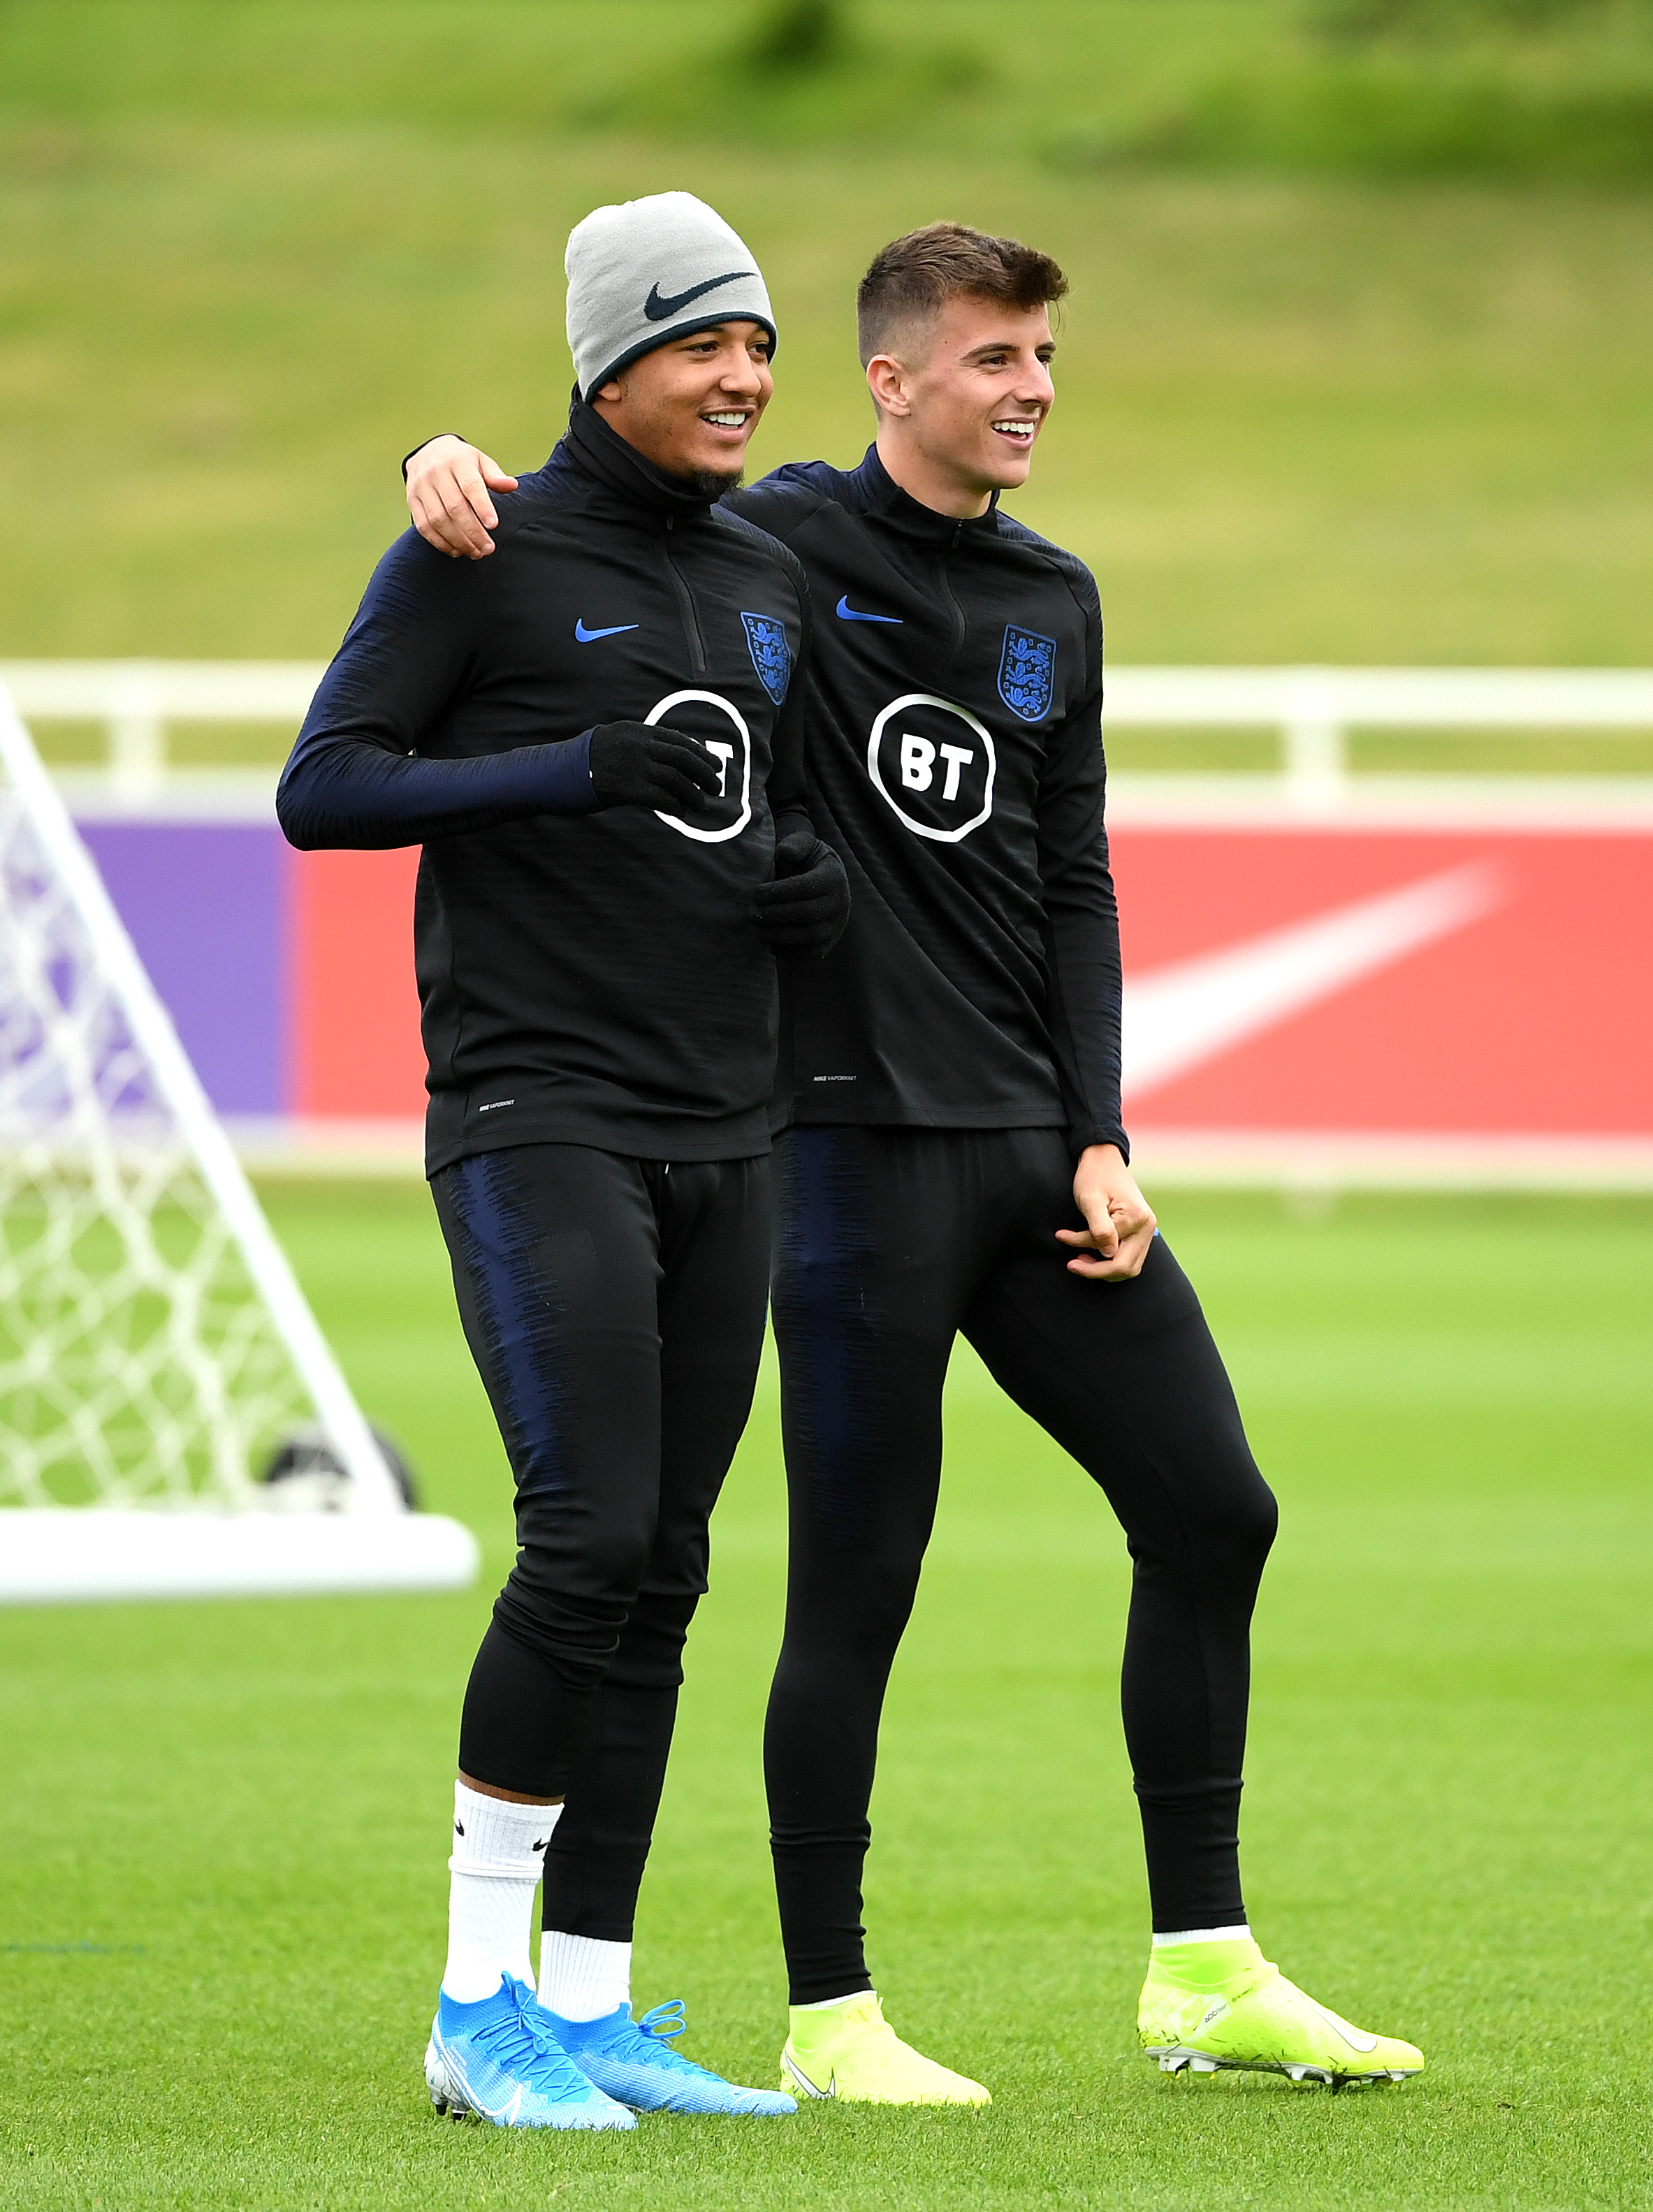 Jadon Sancho idolized Lampard, Drogba, Ronaldinho so obviously he's joining Chelsea